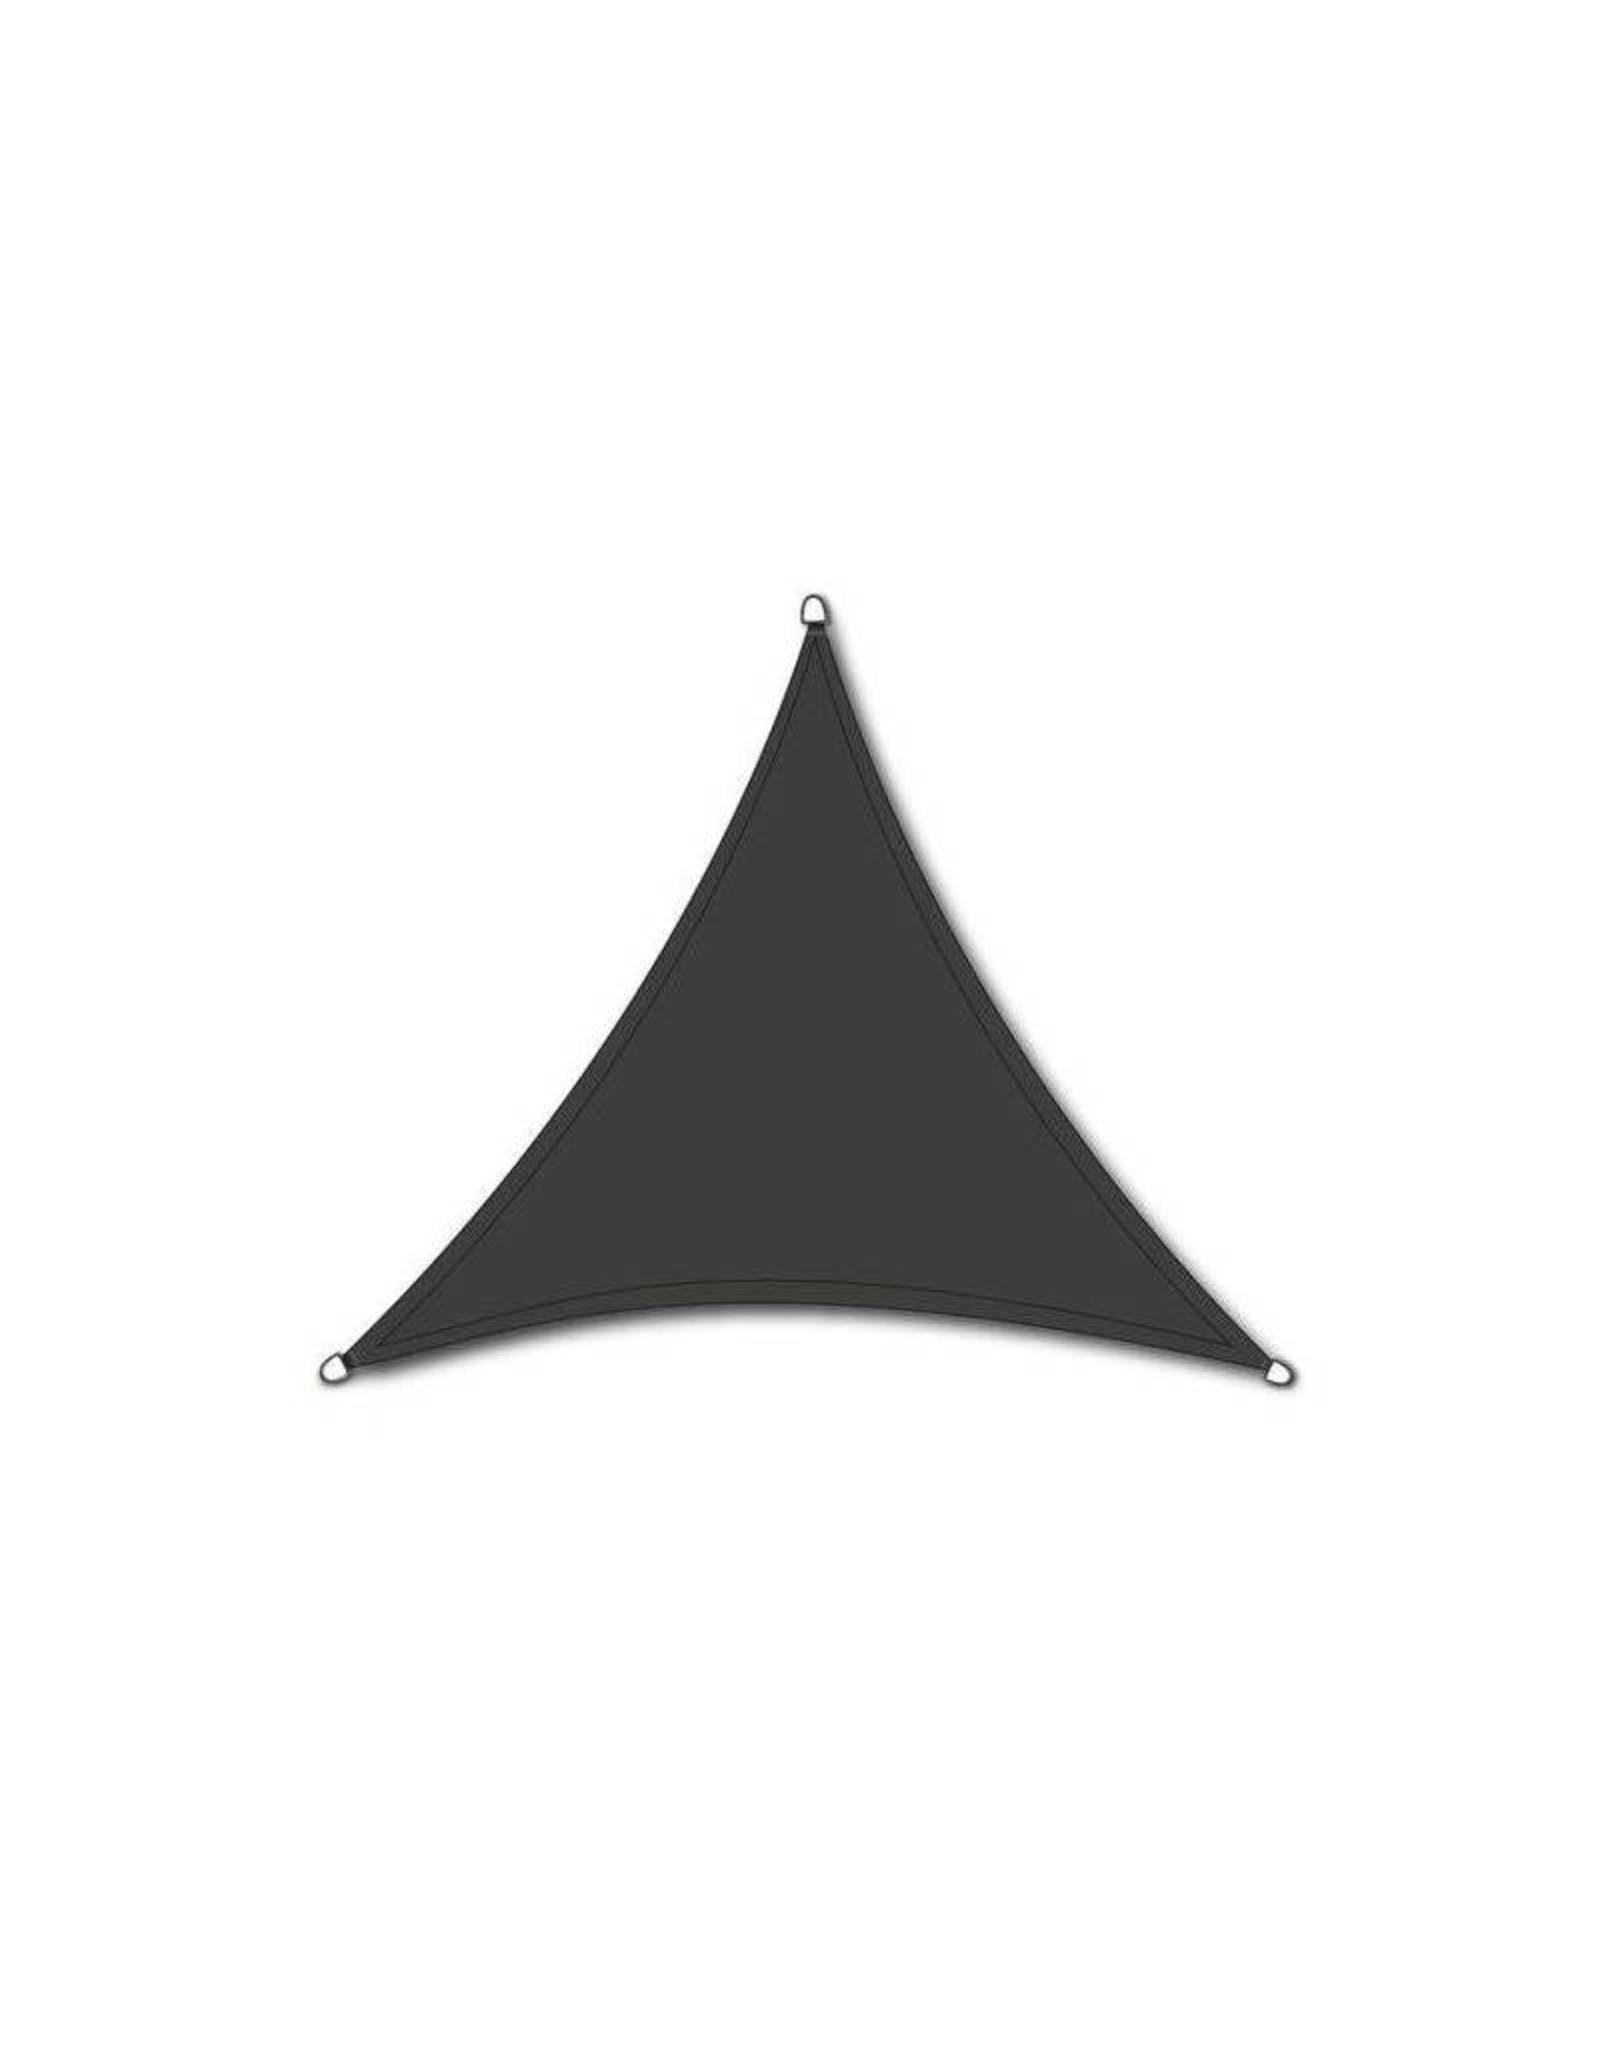 Ambiance - Schaduwdoek - Donkergrijs - 3.6x3.6x3.6m